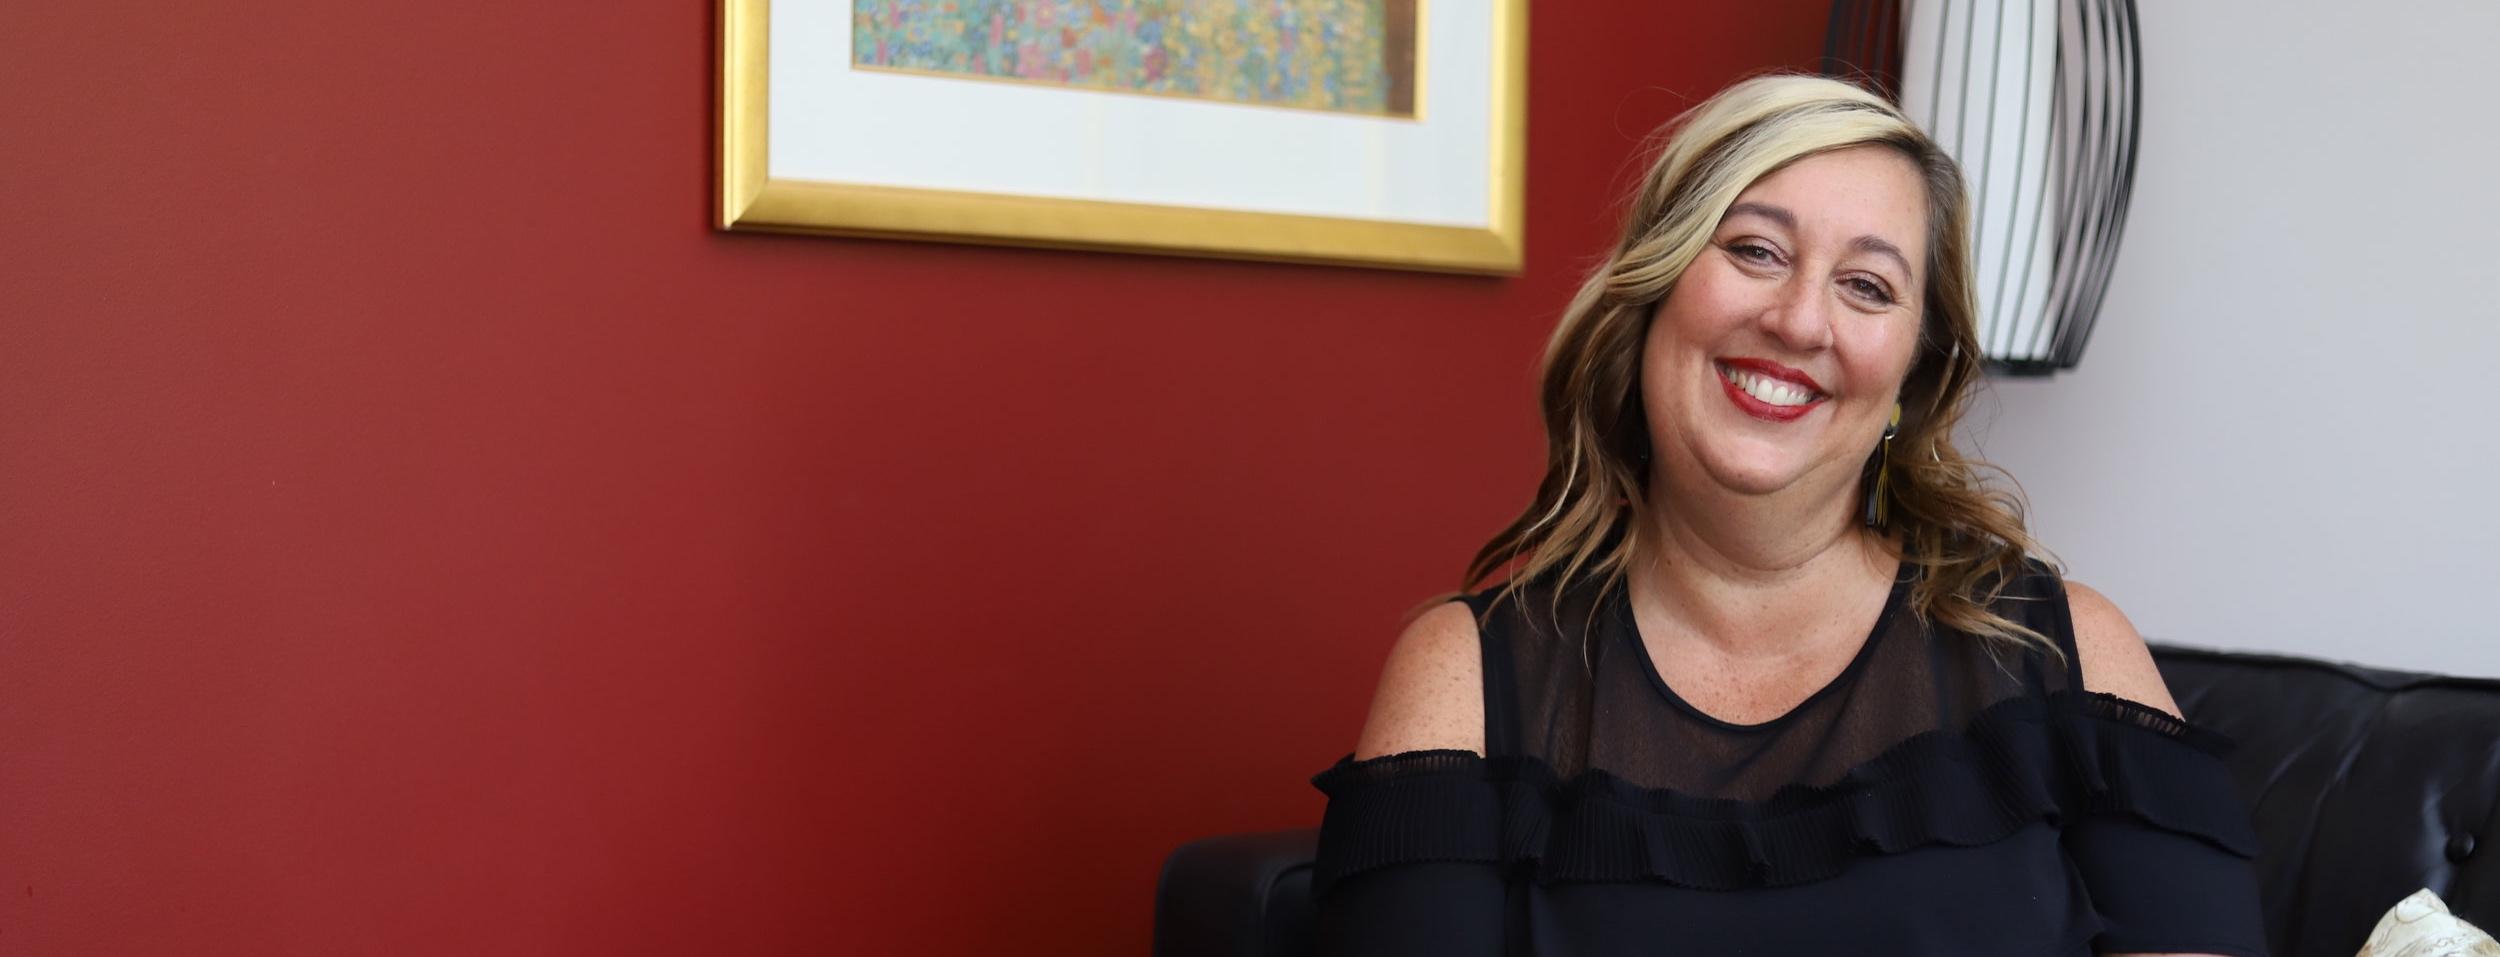 Tanya Koens - Sexologist & Counsellor